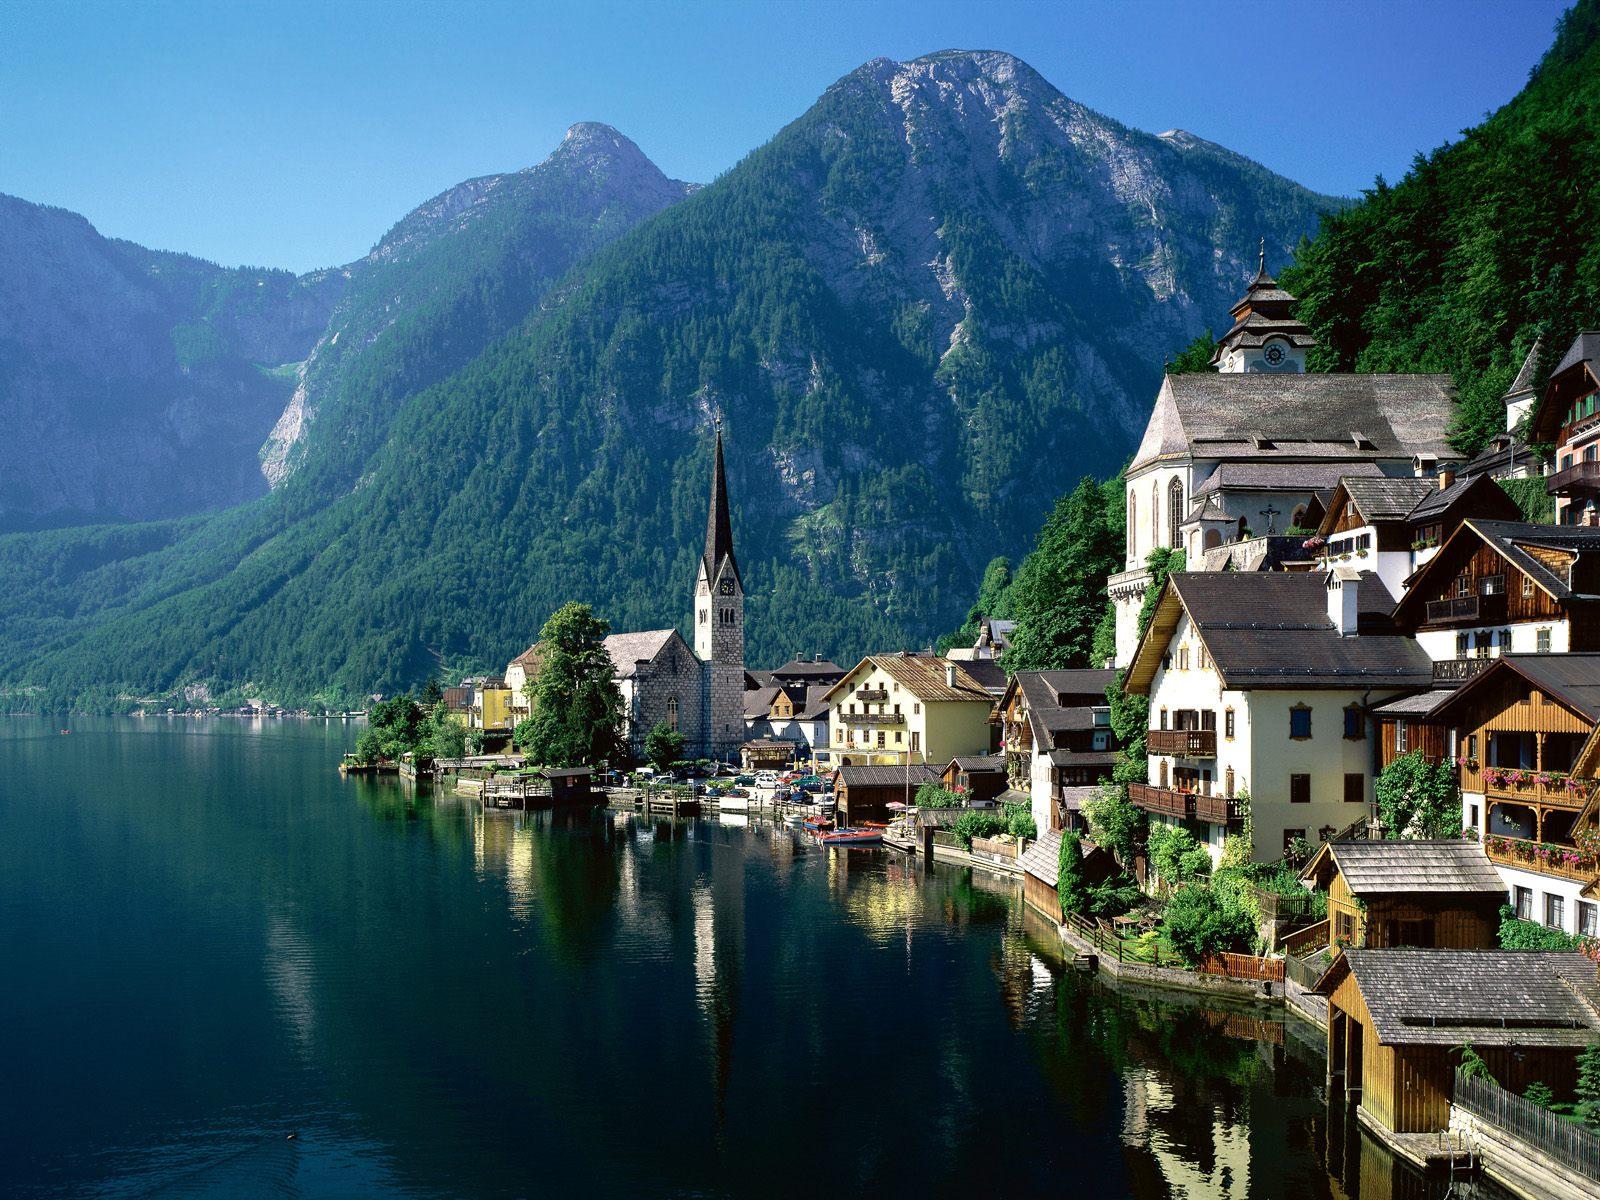 http://1.bp.blogspot.com/_ioD6UOQqcyA/Sw_u94aAfpI/AAAAAAAABoI/LwiSiDjyjf4/s1600/Hallstatt,+Austria.jpg